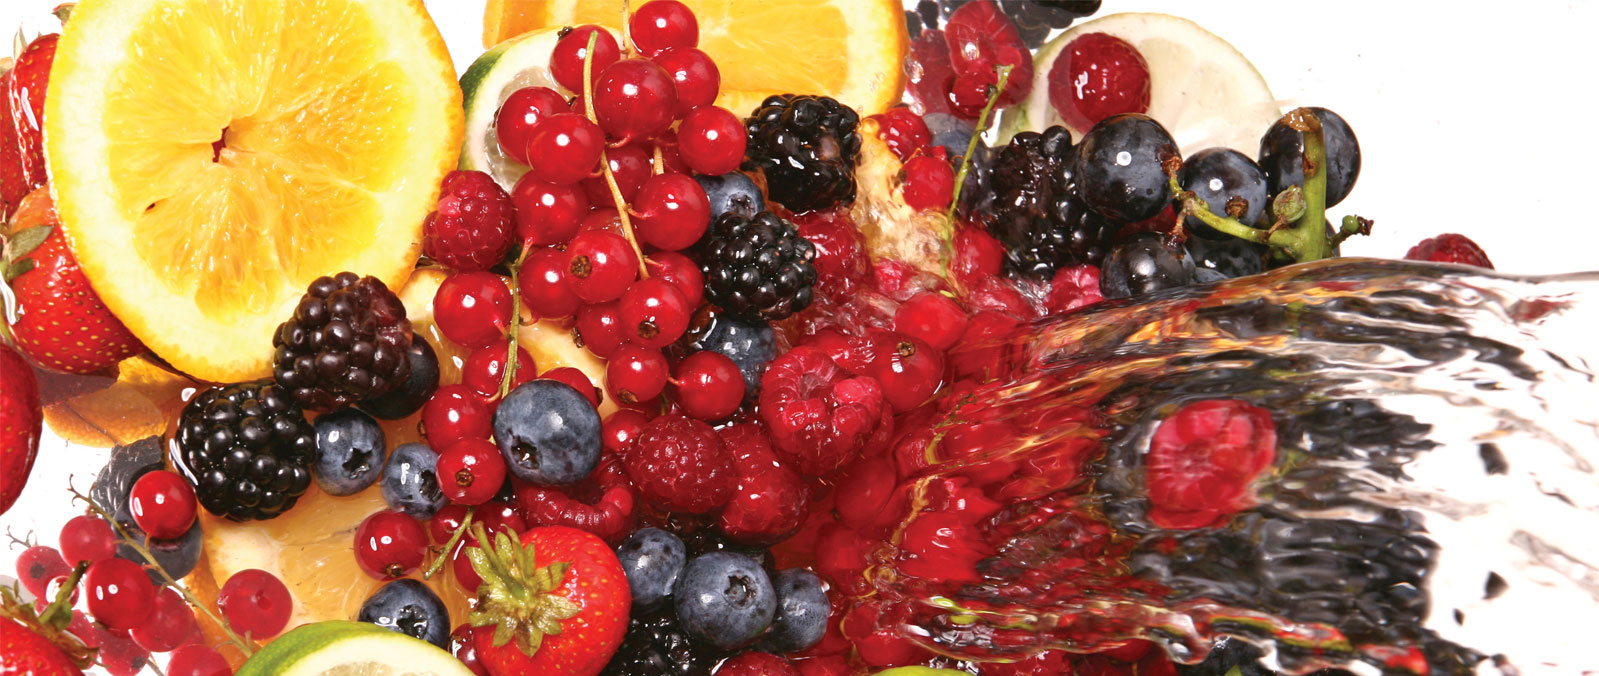 fruit3-1600